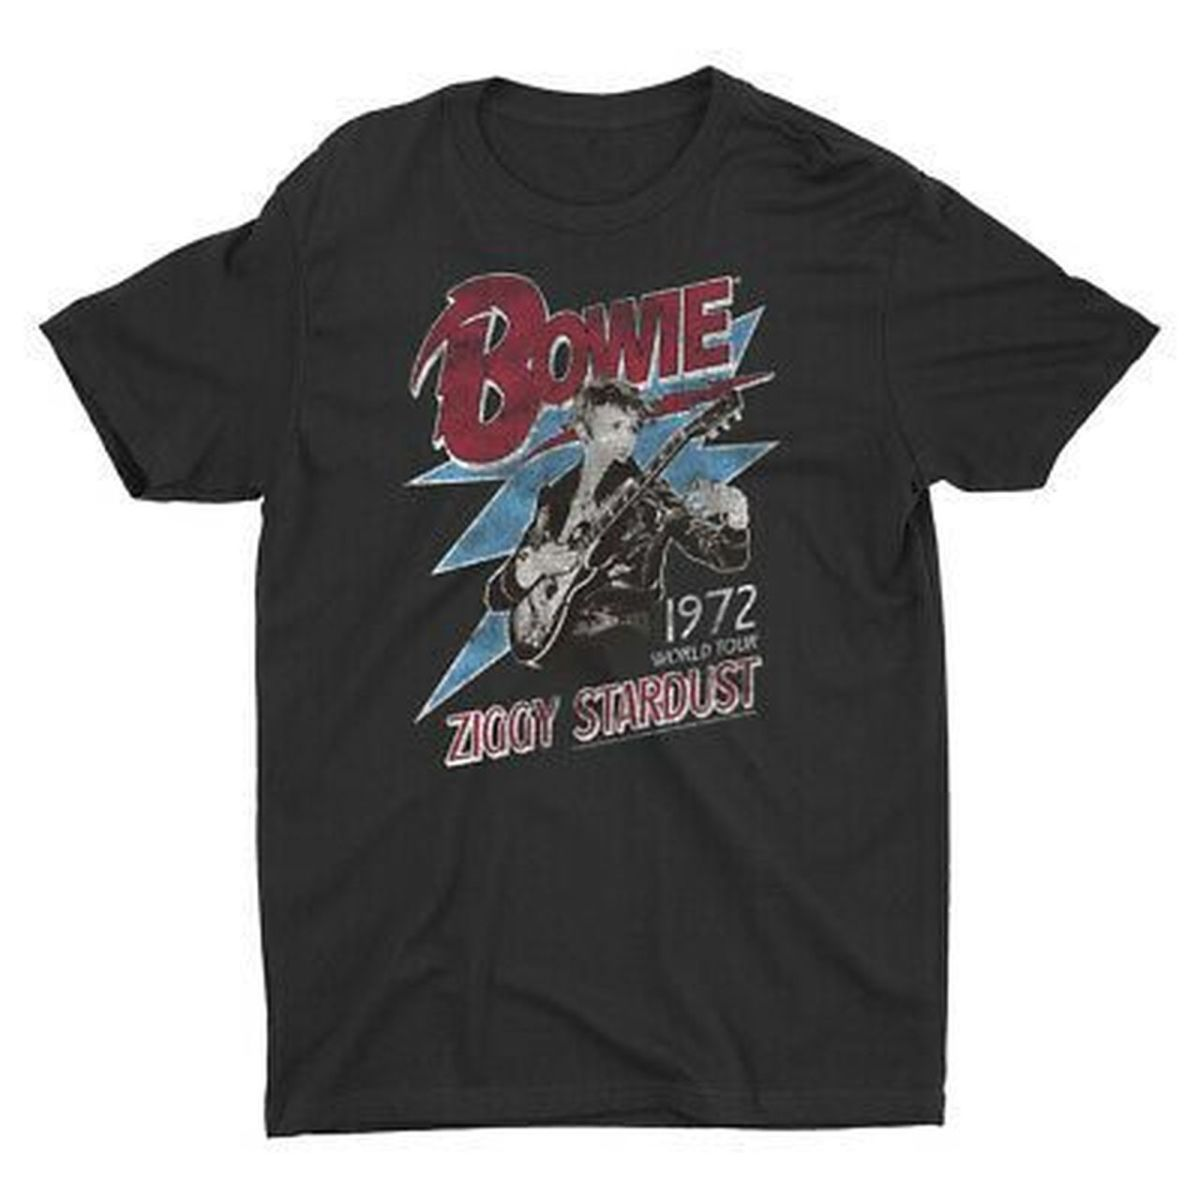 David Bowie Ziggy Stardust 1972 World Tour T-shirt